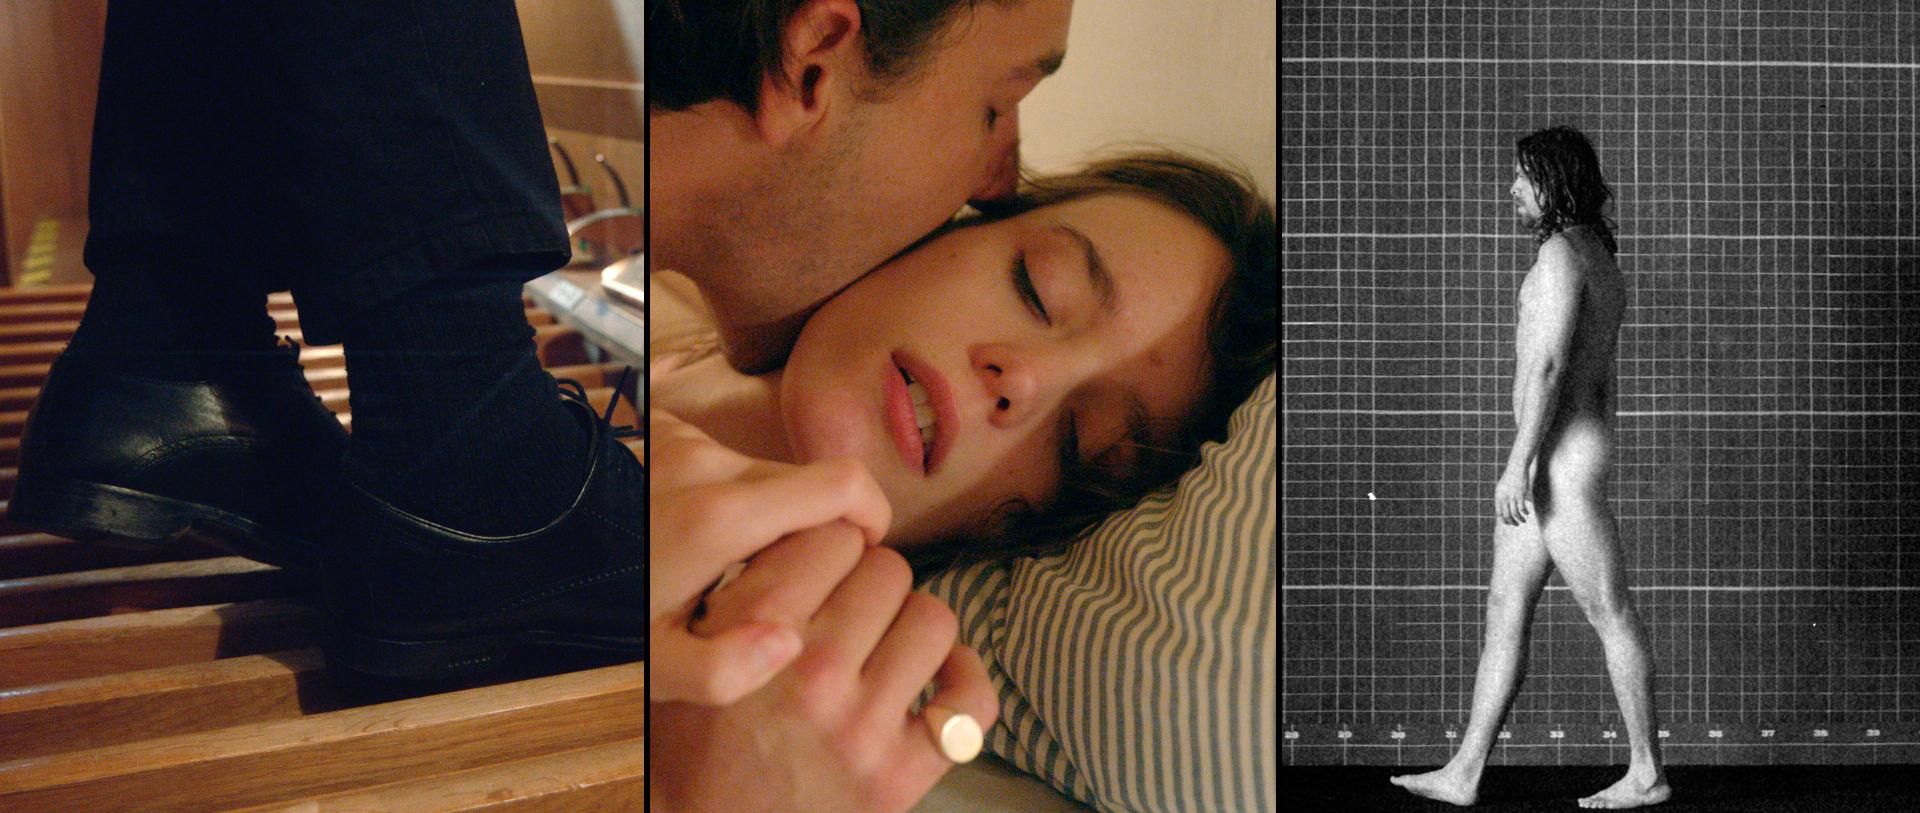 Секс чоловка з чоловком онлайн